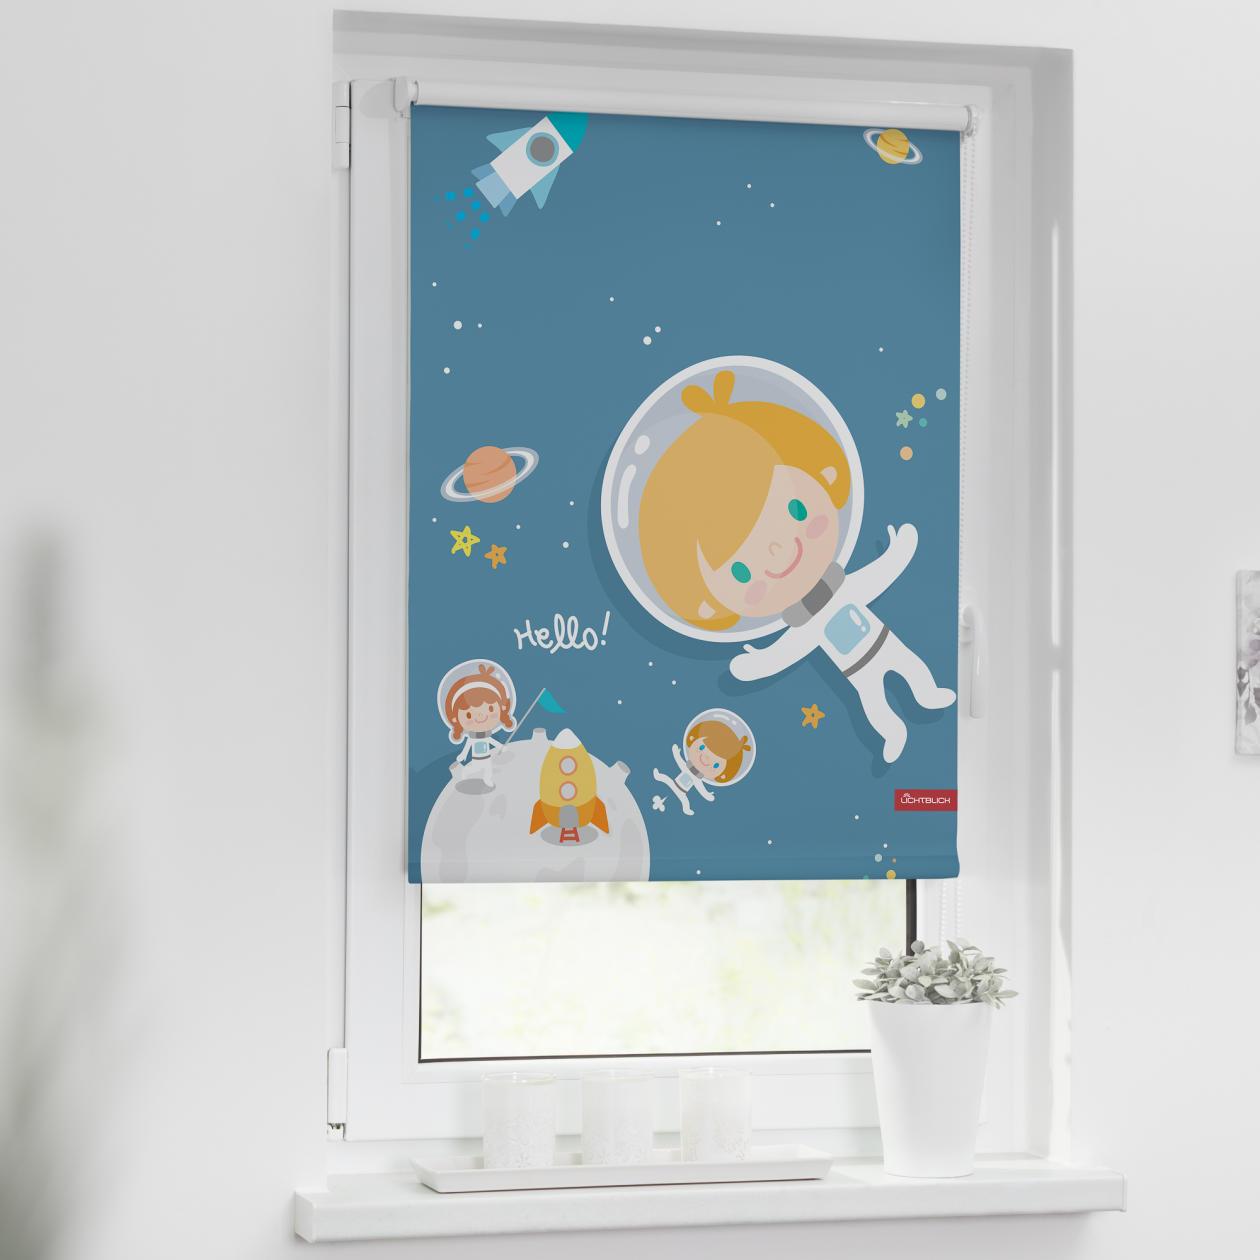 verdunkelungsrollo klemmfix ohne bohren astronaut blau lichblick shop. Black Bedroom Furniture Sets. Home Design Ideas